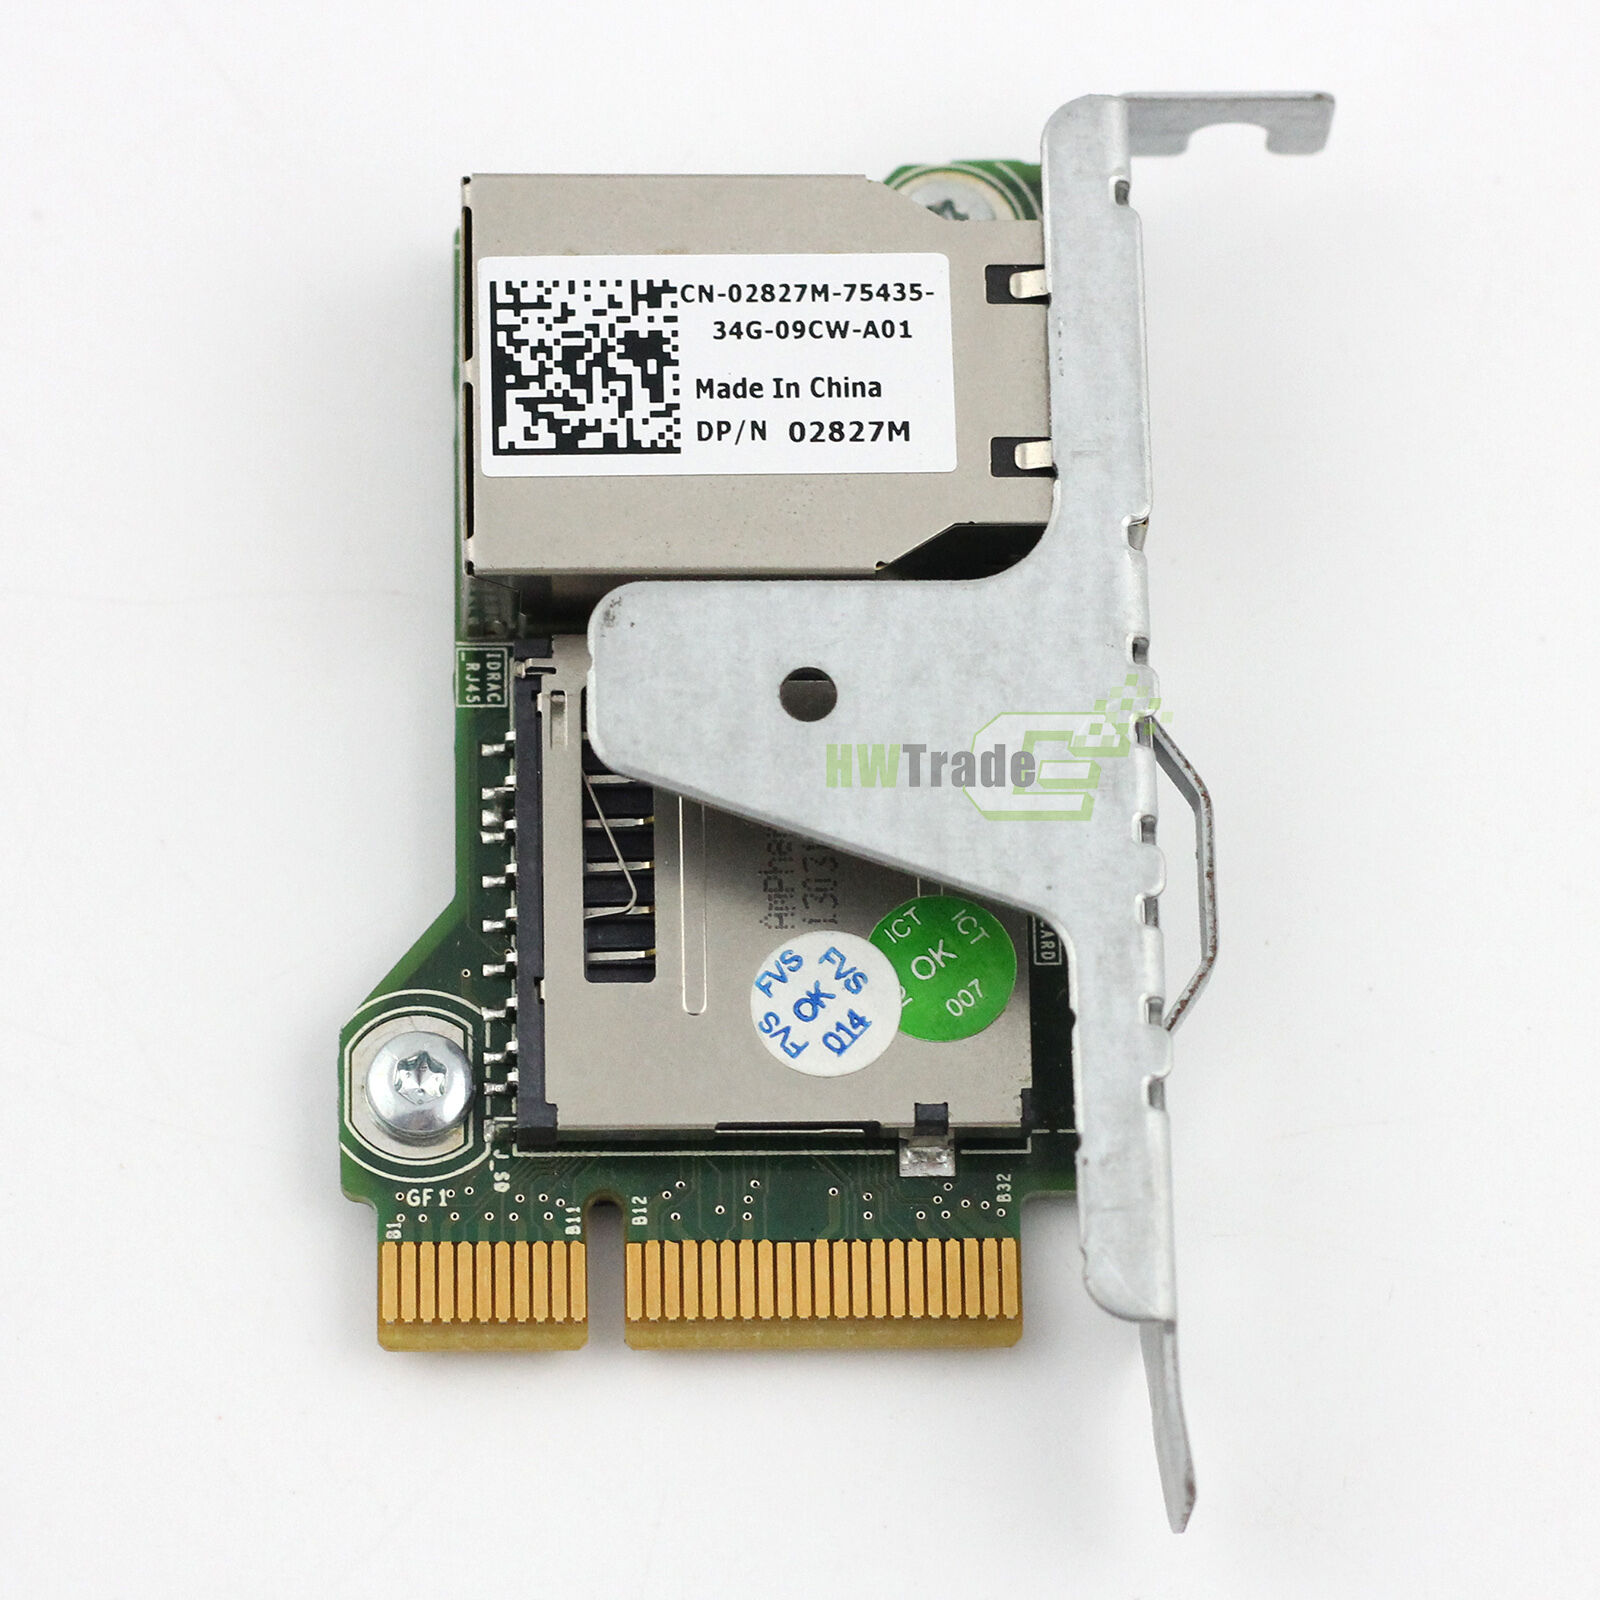 Dell iDRAC7 02827M Express Remote Access PowerEdge R320 R420 R520 R620 T320 T420